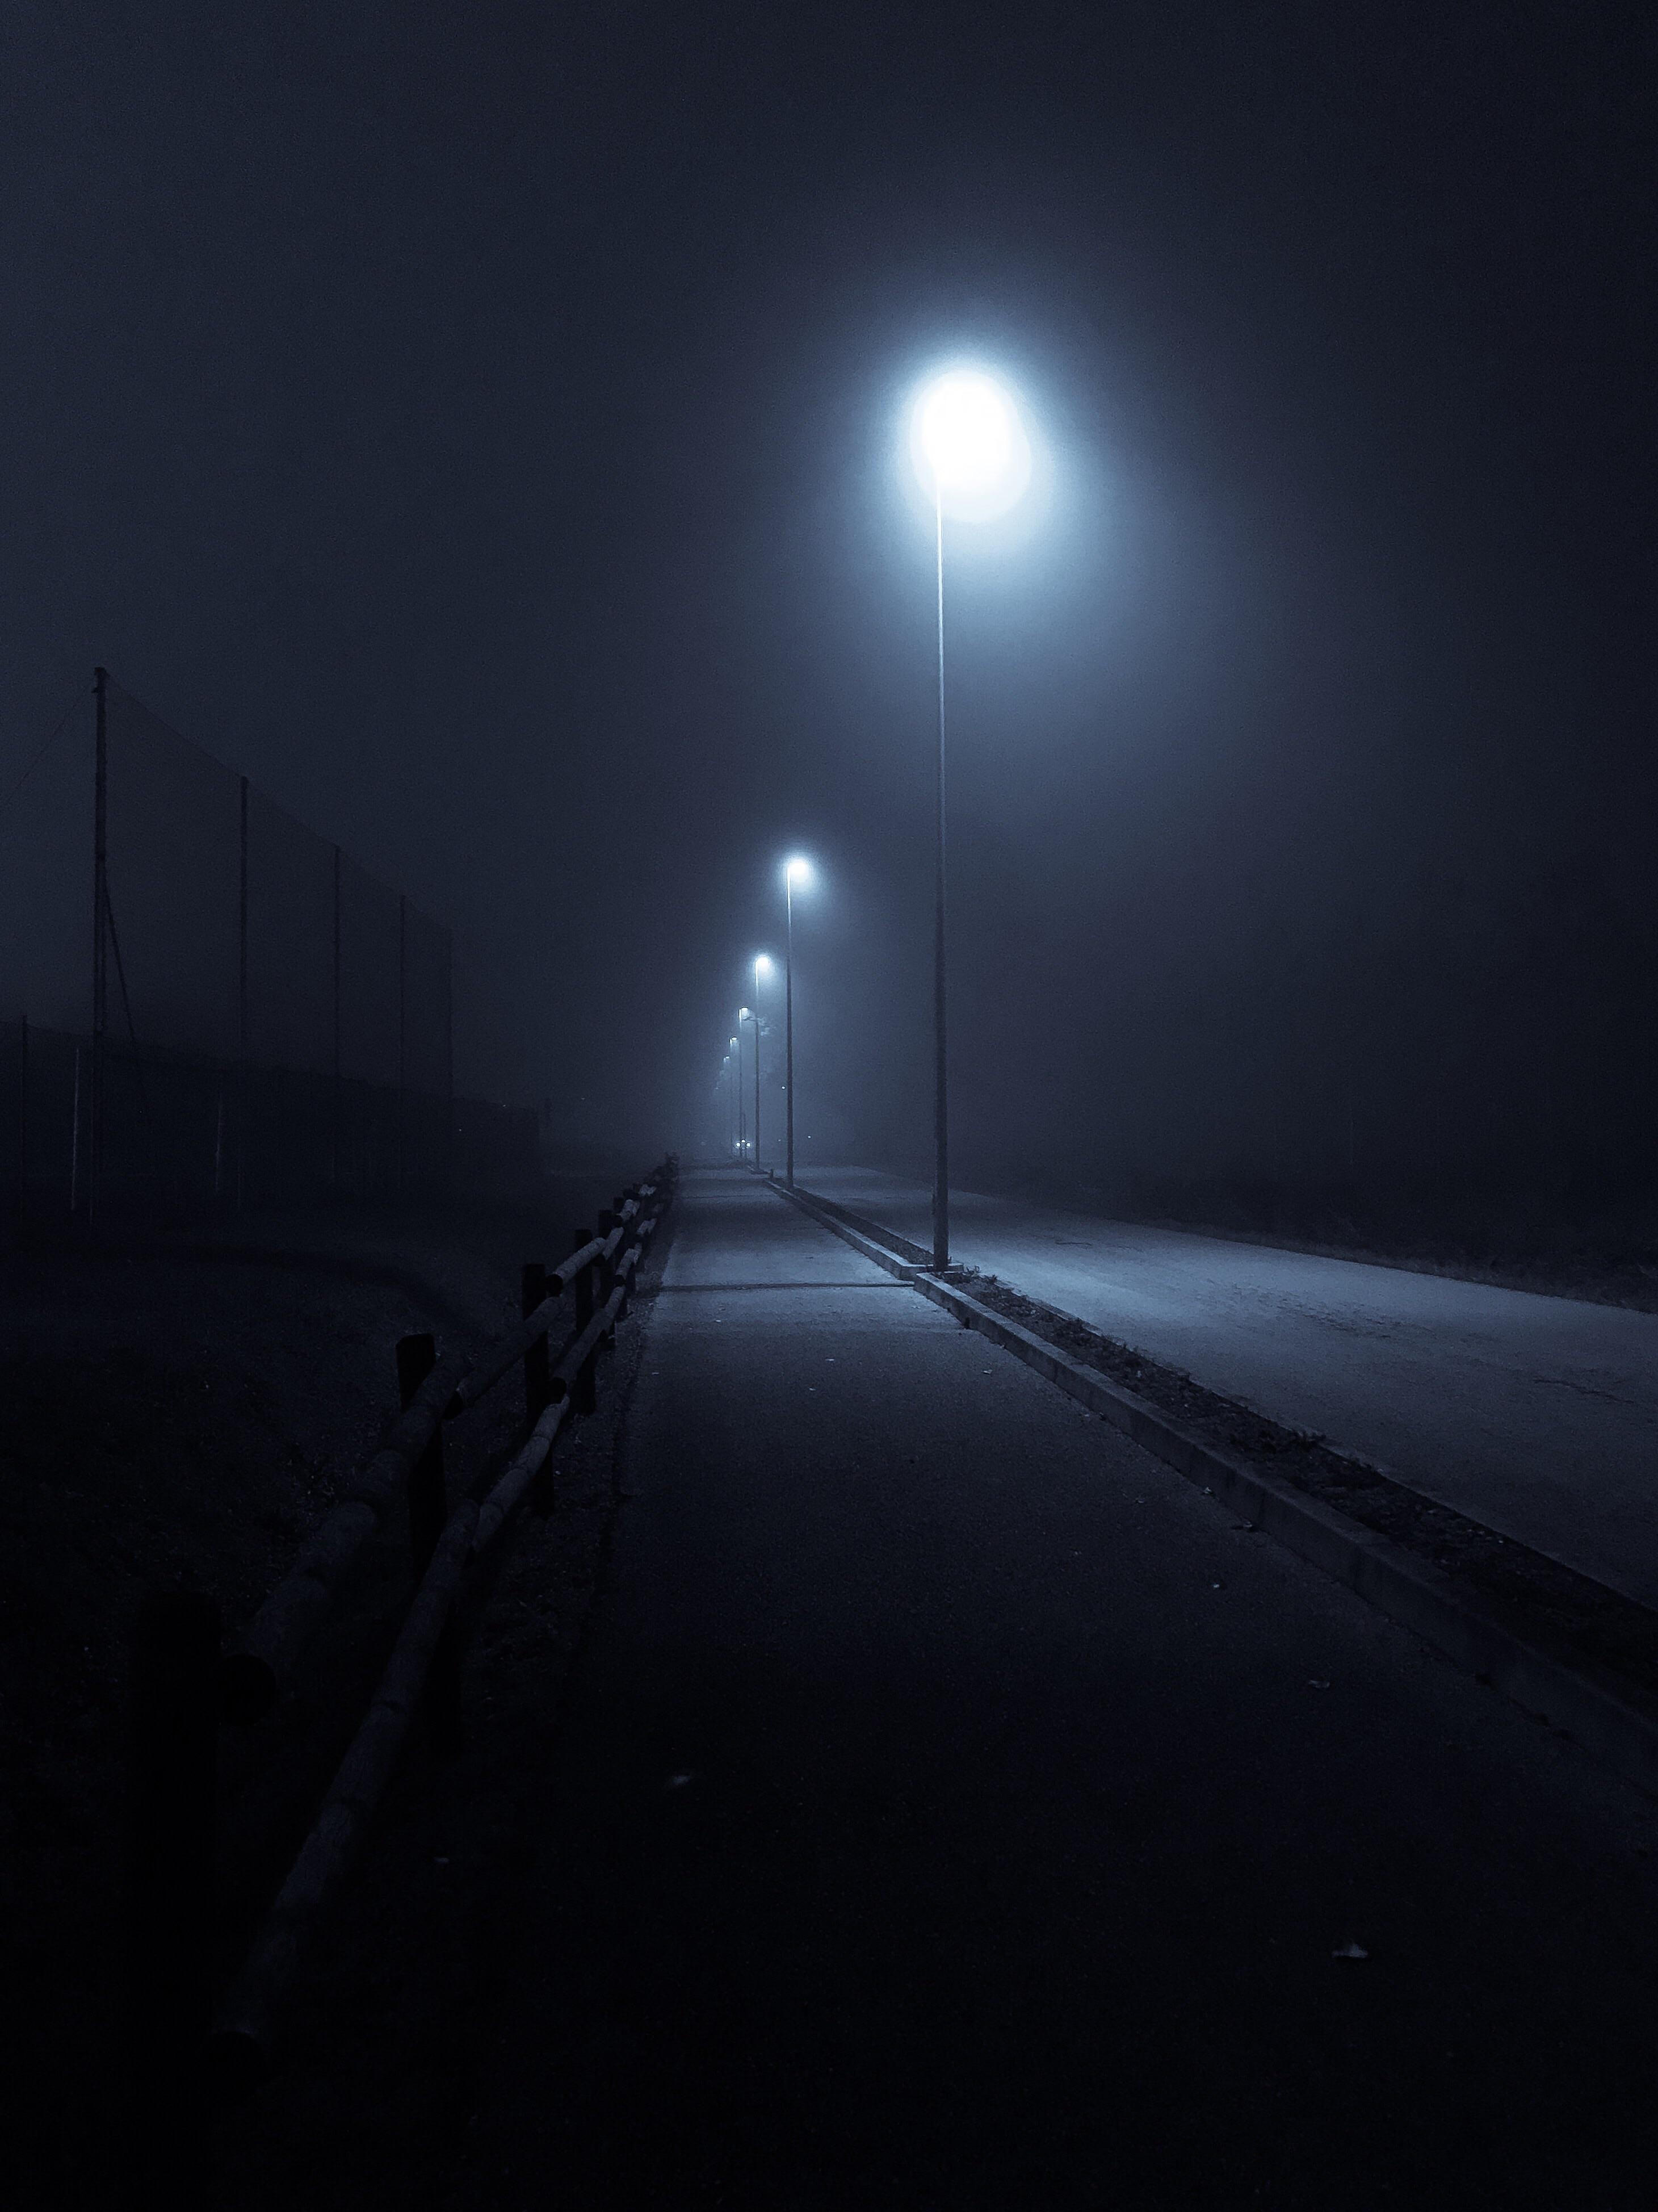 Zepeto Background Aesthetic Dark Aesthetic Zepeto Background In 2020 Night Scenery Night Aesthetic Dark Aesthetic